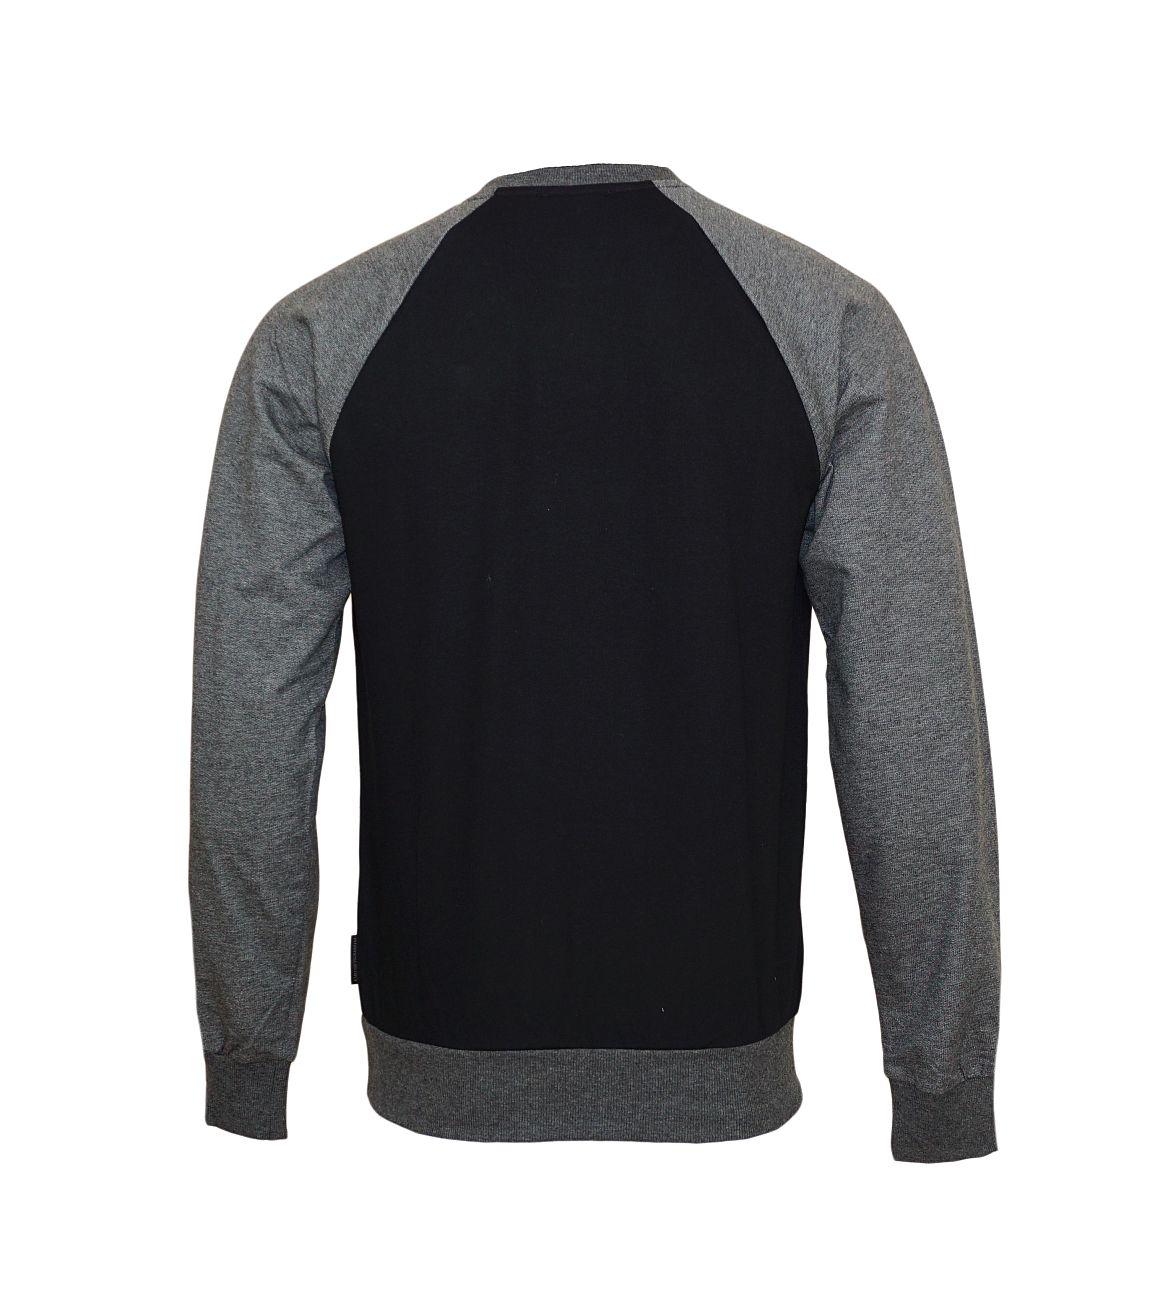 Emporio Armani Pullover Sweater Rundhals 111062 8A566 00020 NERO WX18-EAS